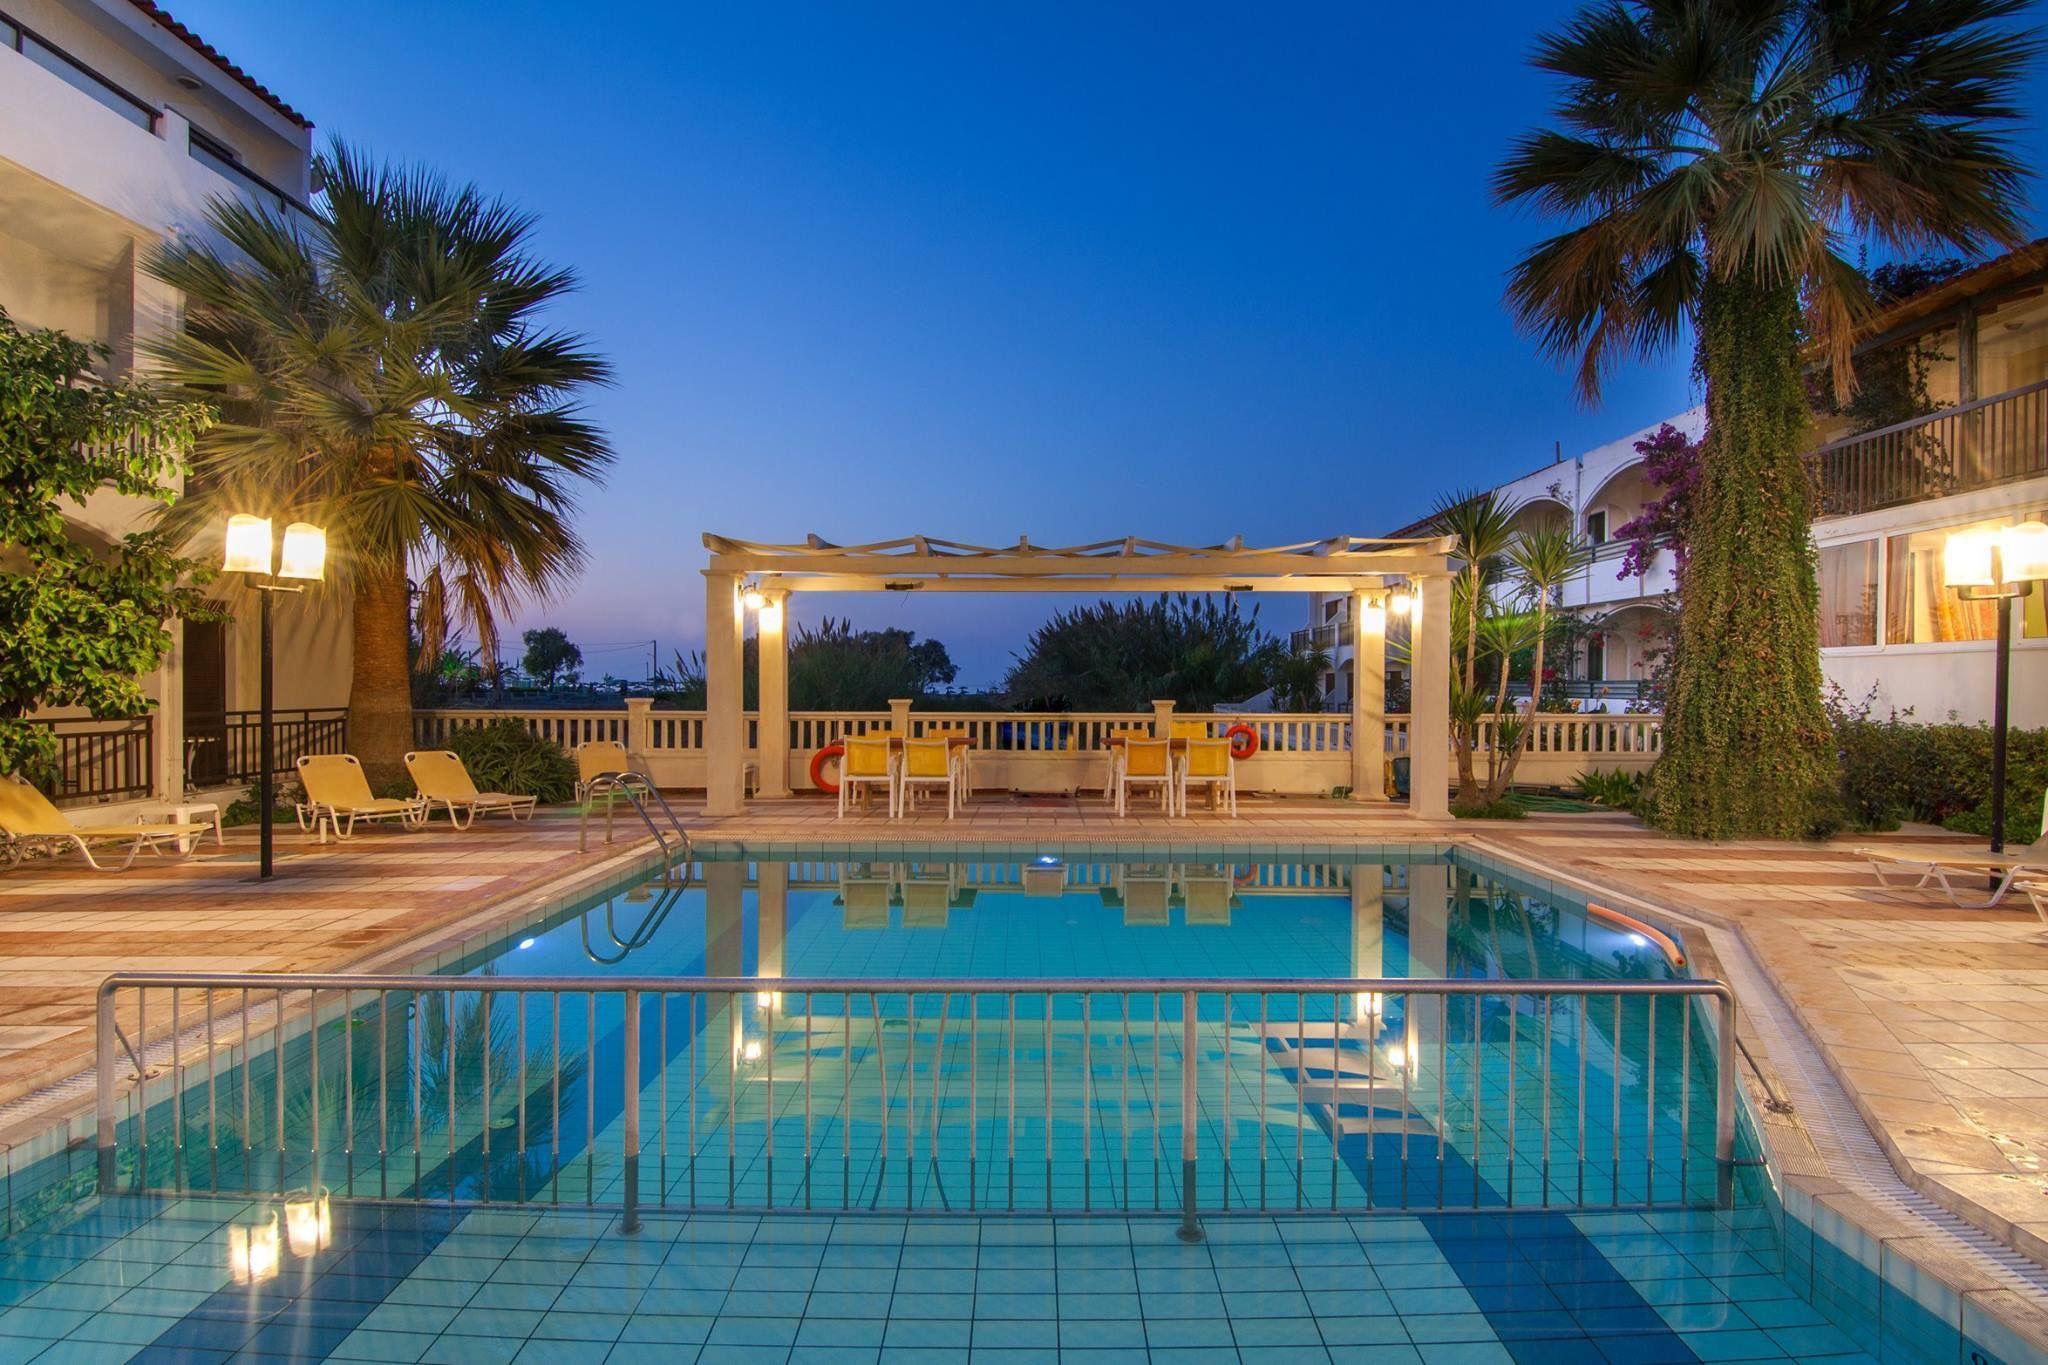 The Pool At Trefon Hotel In Motakis Village Holiday Complex Platanes Rethymnon Crete Greece